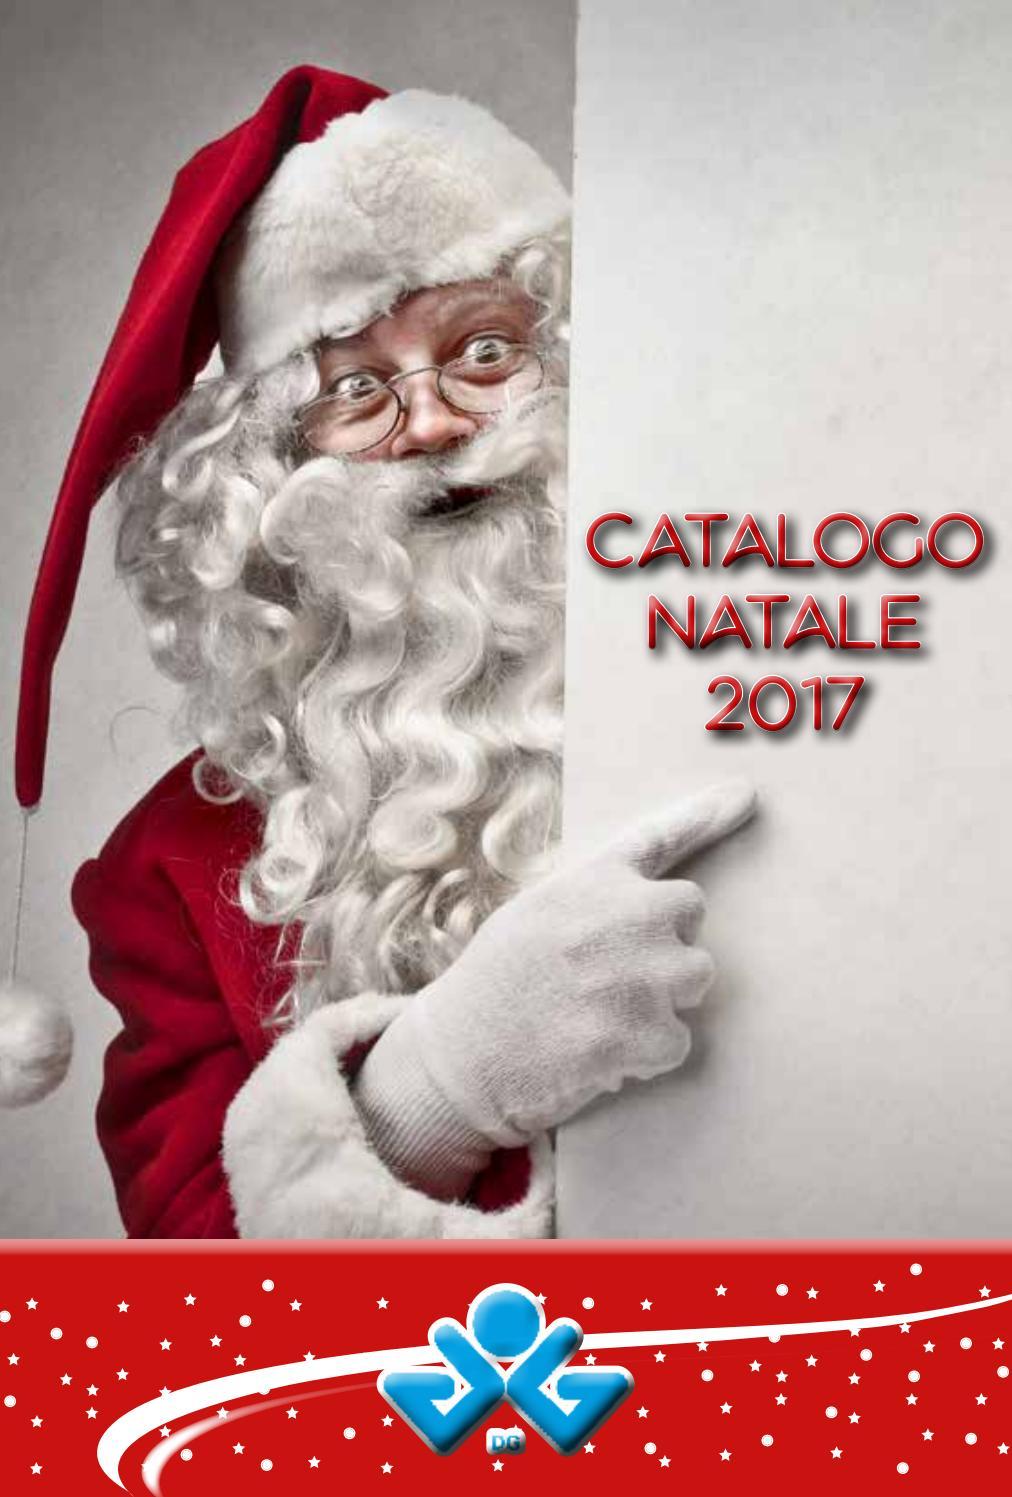 Caldara catalogo natale 2017 by hi keep issuu for Ikea natale catalogo 2017